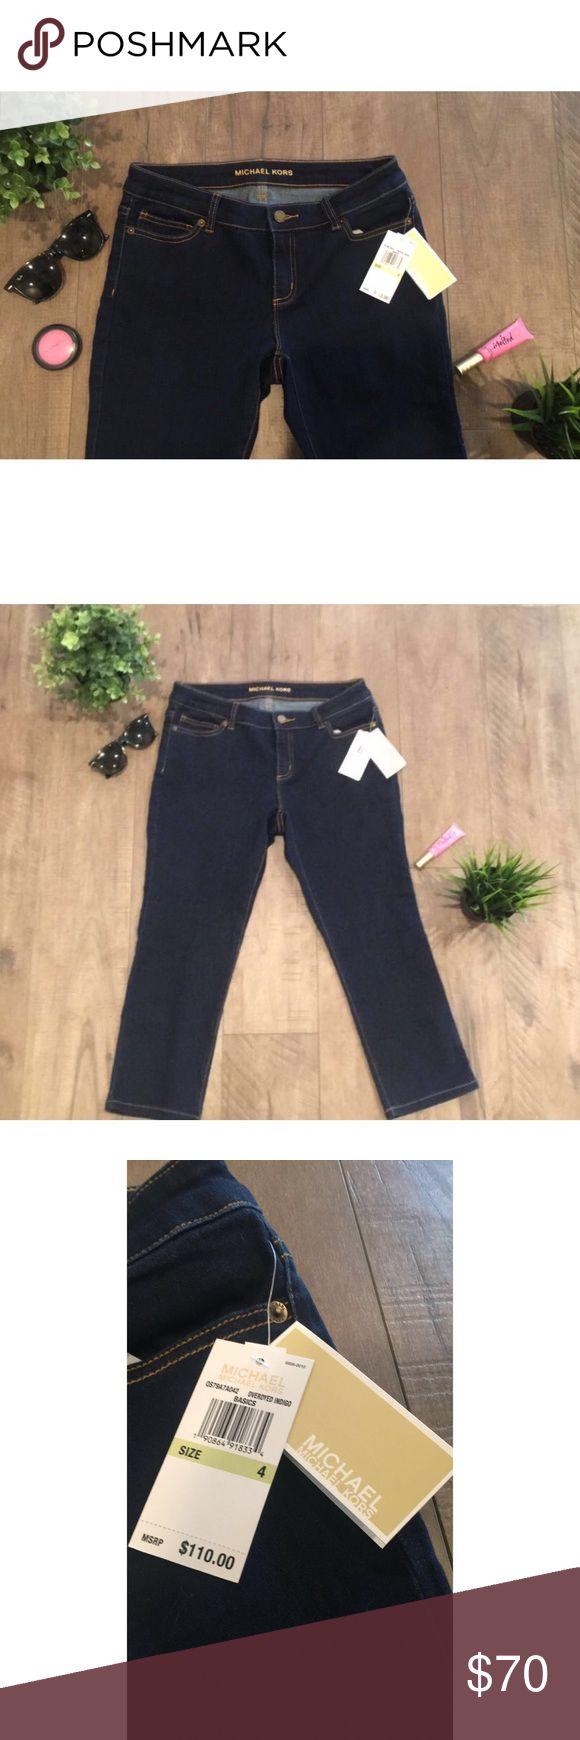 NWT Michael Kors jeans NWT, never worn. Michael Kors Cropped jeans Michael Kors Jeans Ankle & Cropped